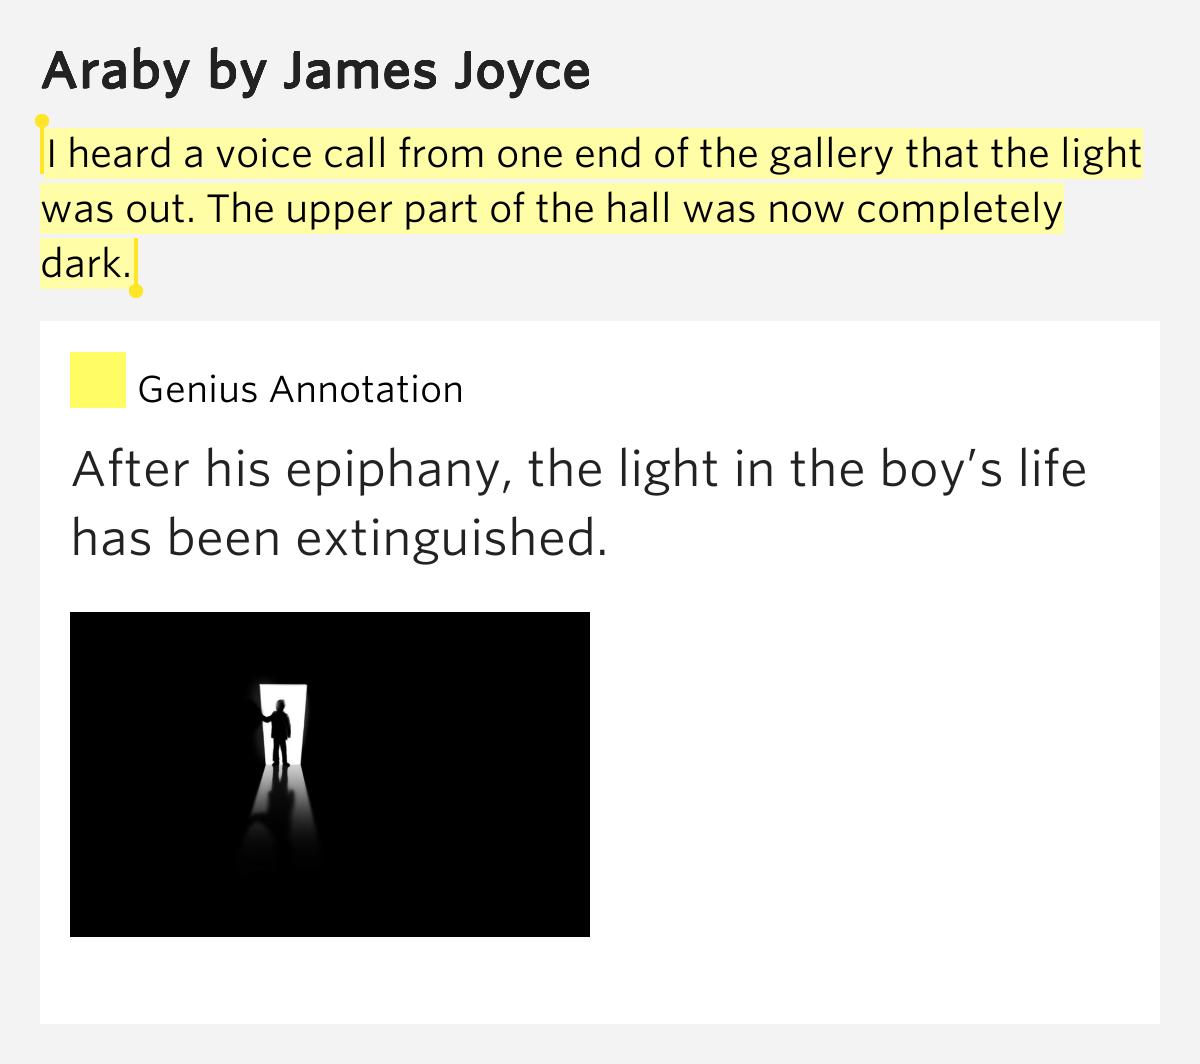 imagery in james joyce araby James joyce, symbolism in story araby free essays, james joyce, symbolism in story araby papers most popular james joyce, symbolism in story araby essays and.